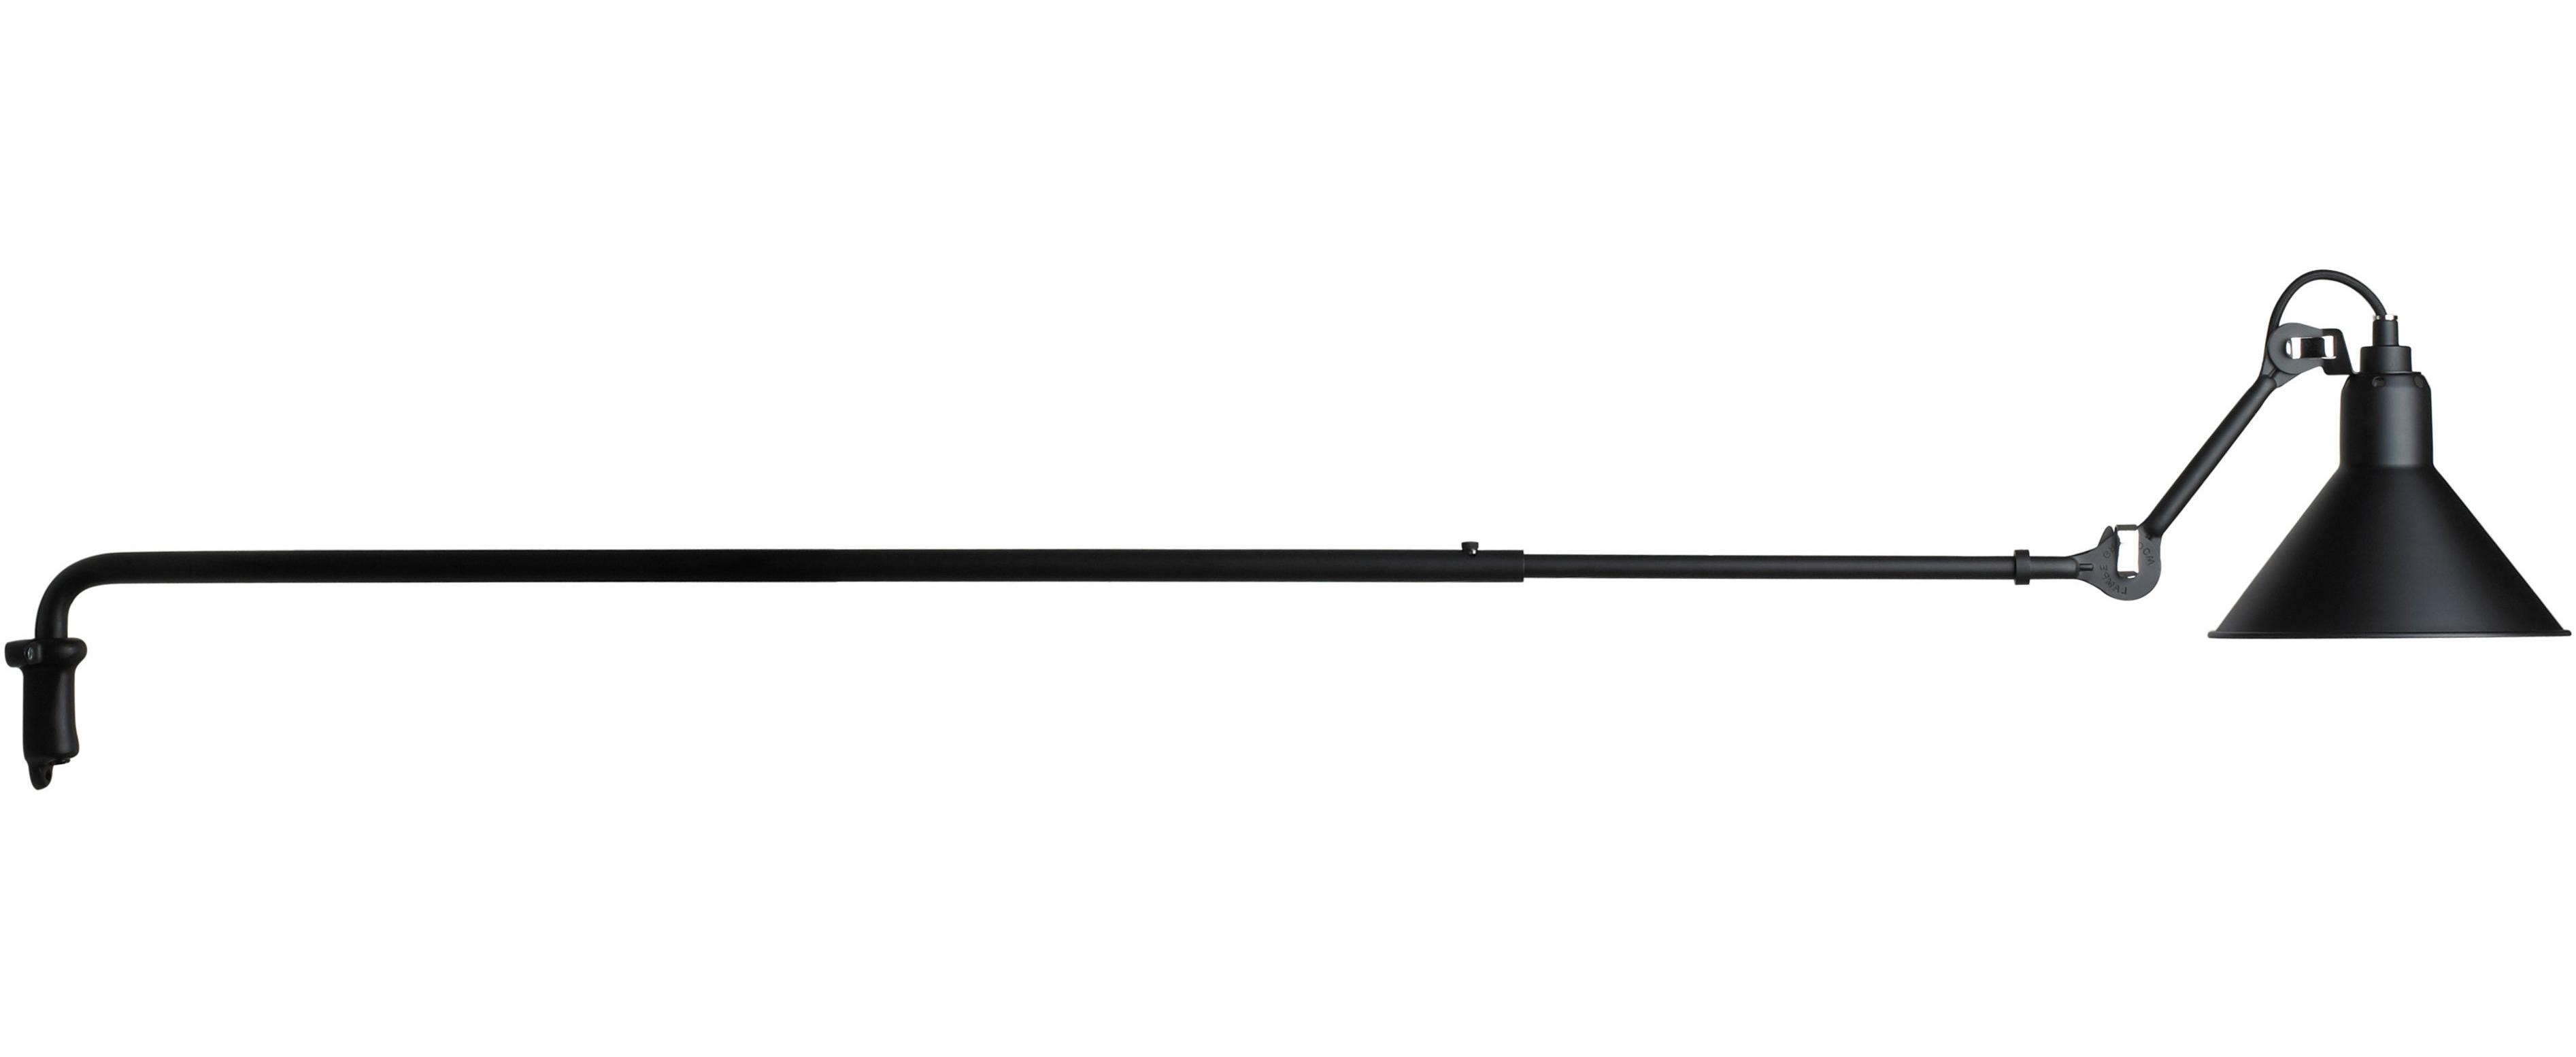 Leuchten - Wandleuchten - N°213 Wandleuchte / mit Teleskoparm - DCW éditions - Schwarz, matt - Stahl